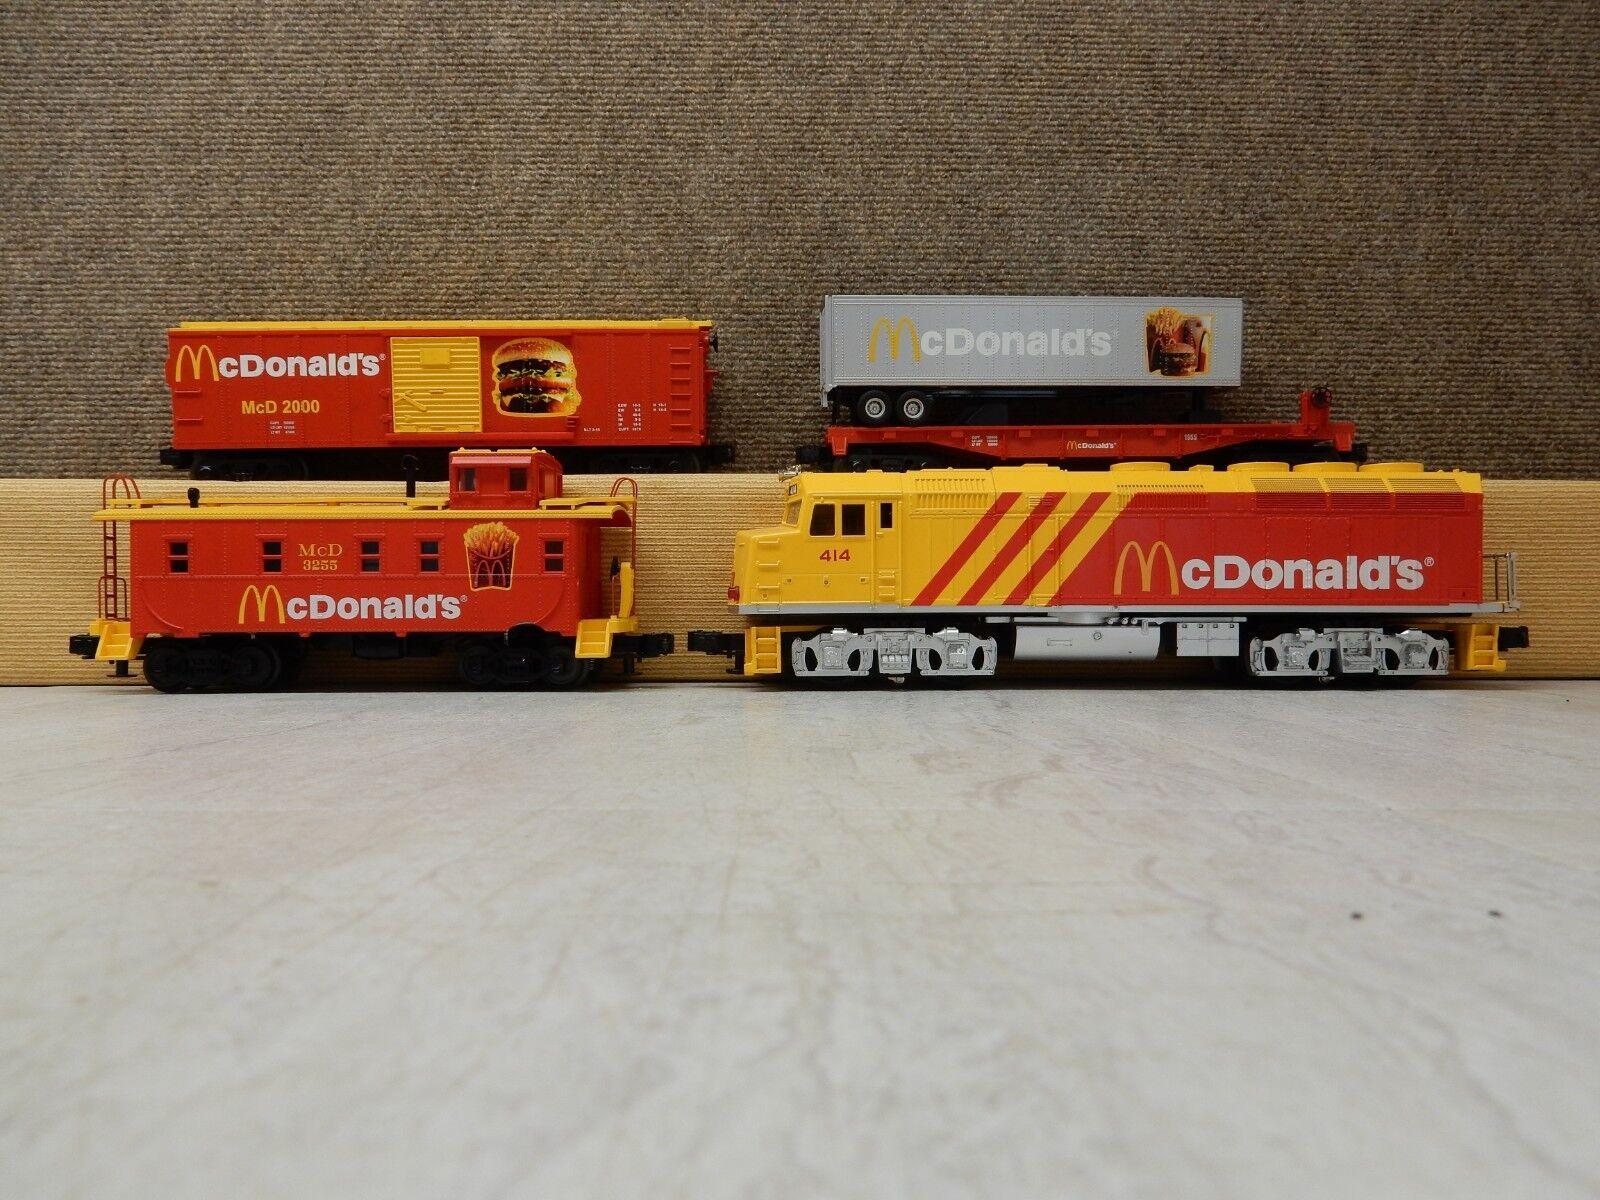 MTH RAILKING 30-4042-0 McDonalds F40ph Diesel Engine Freight Train   32